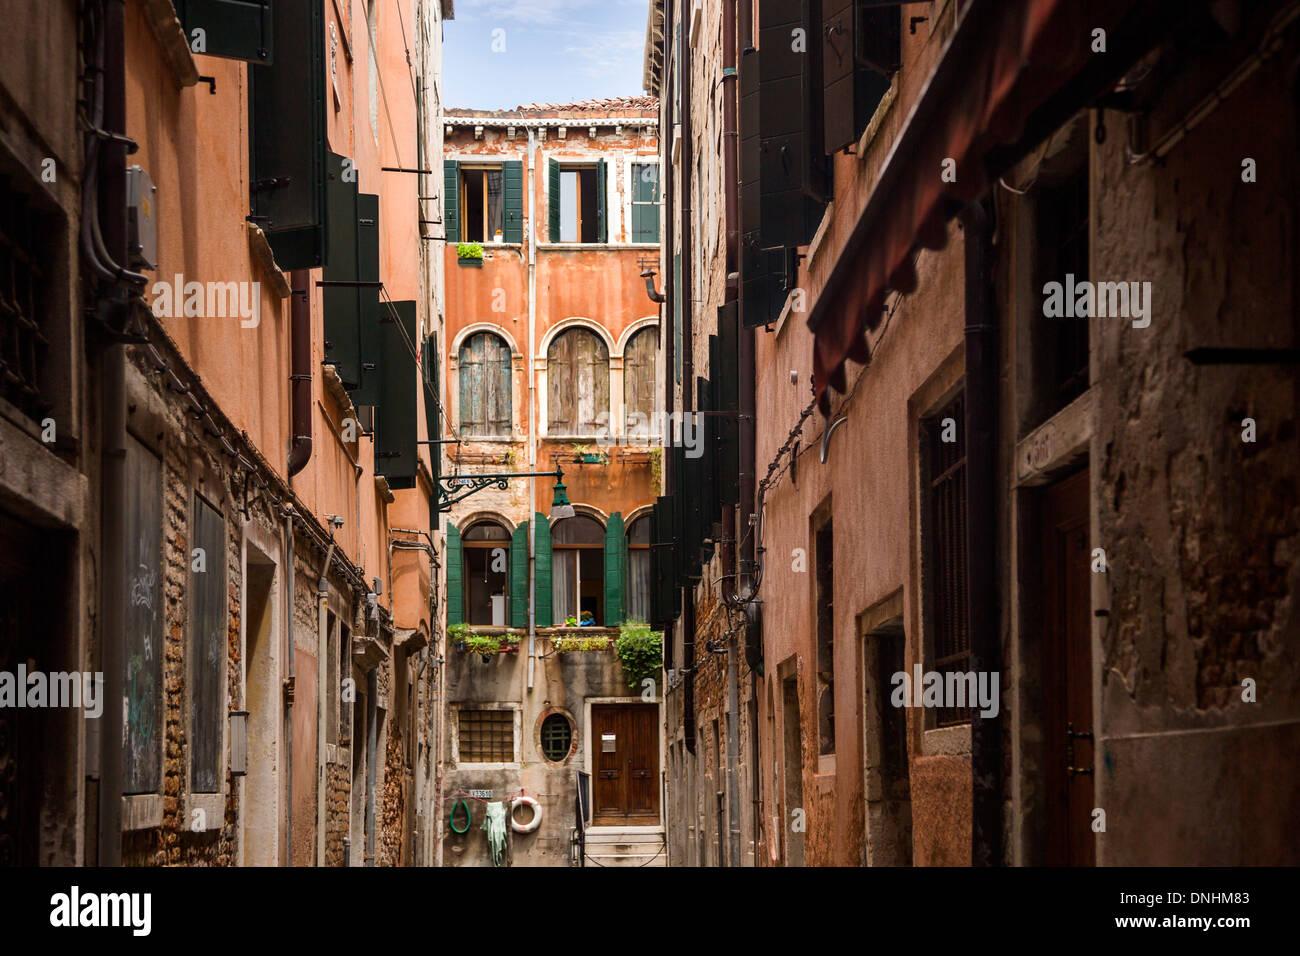 Buildings along a street, Venice, Veneto, Italy Stock Photo